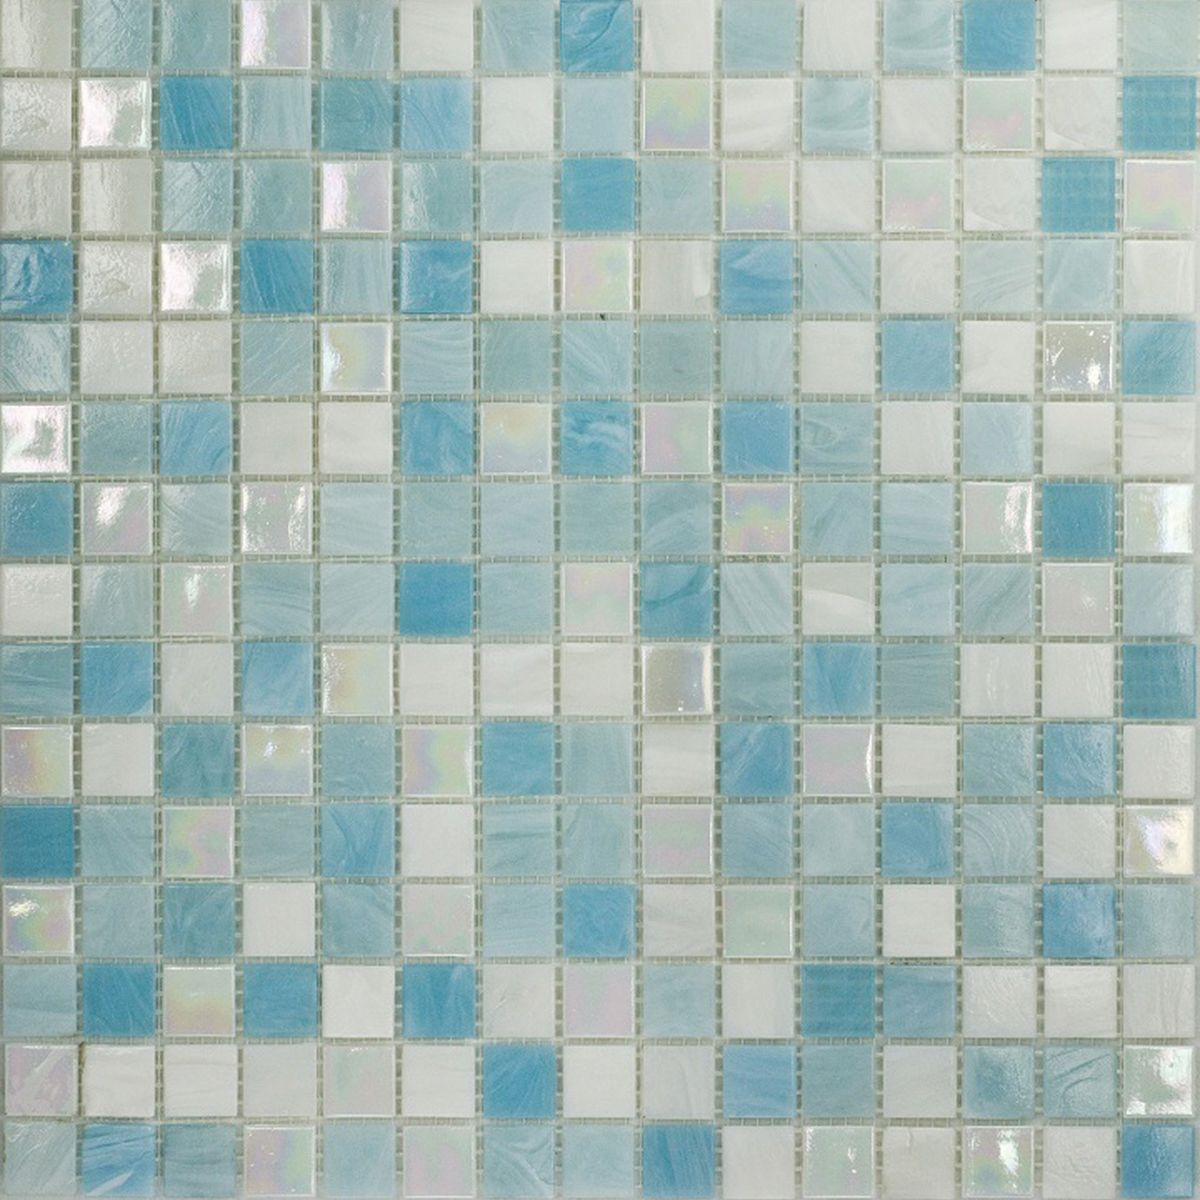 Piastrelle bagno mosaico azzurro yl85 regardsdefemmes for Mosaico bisazza prezzi